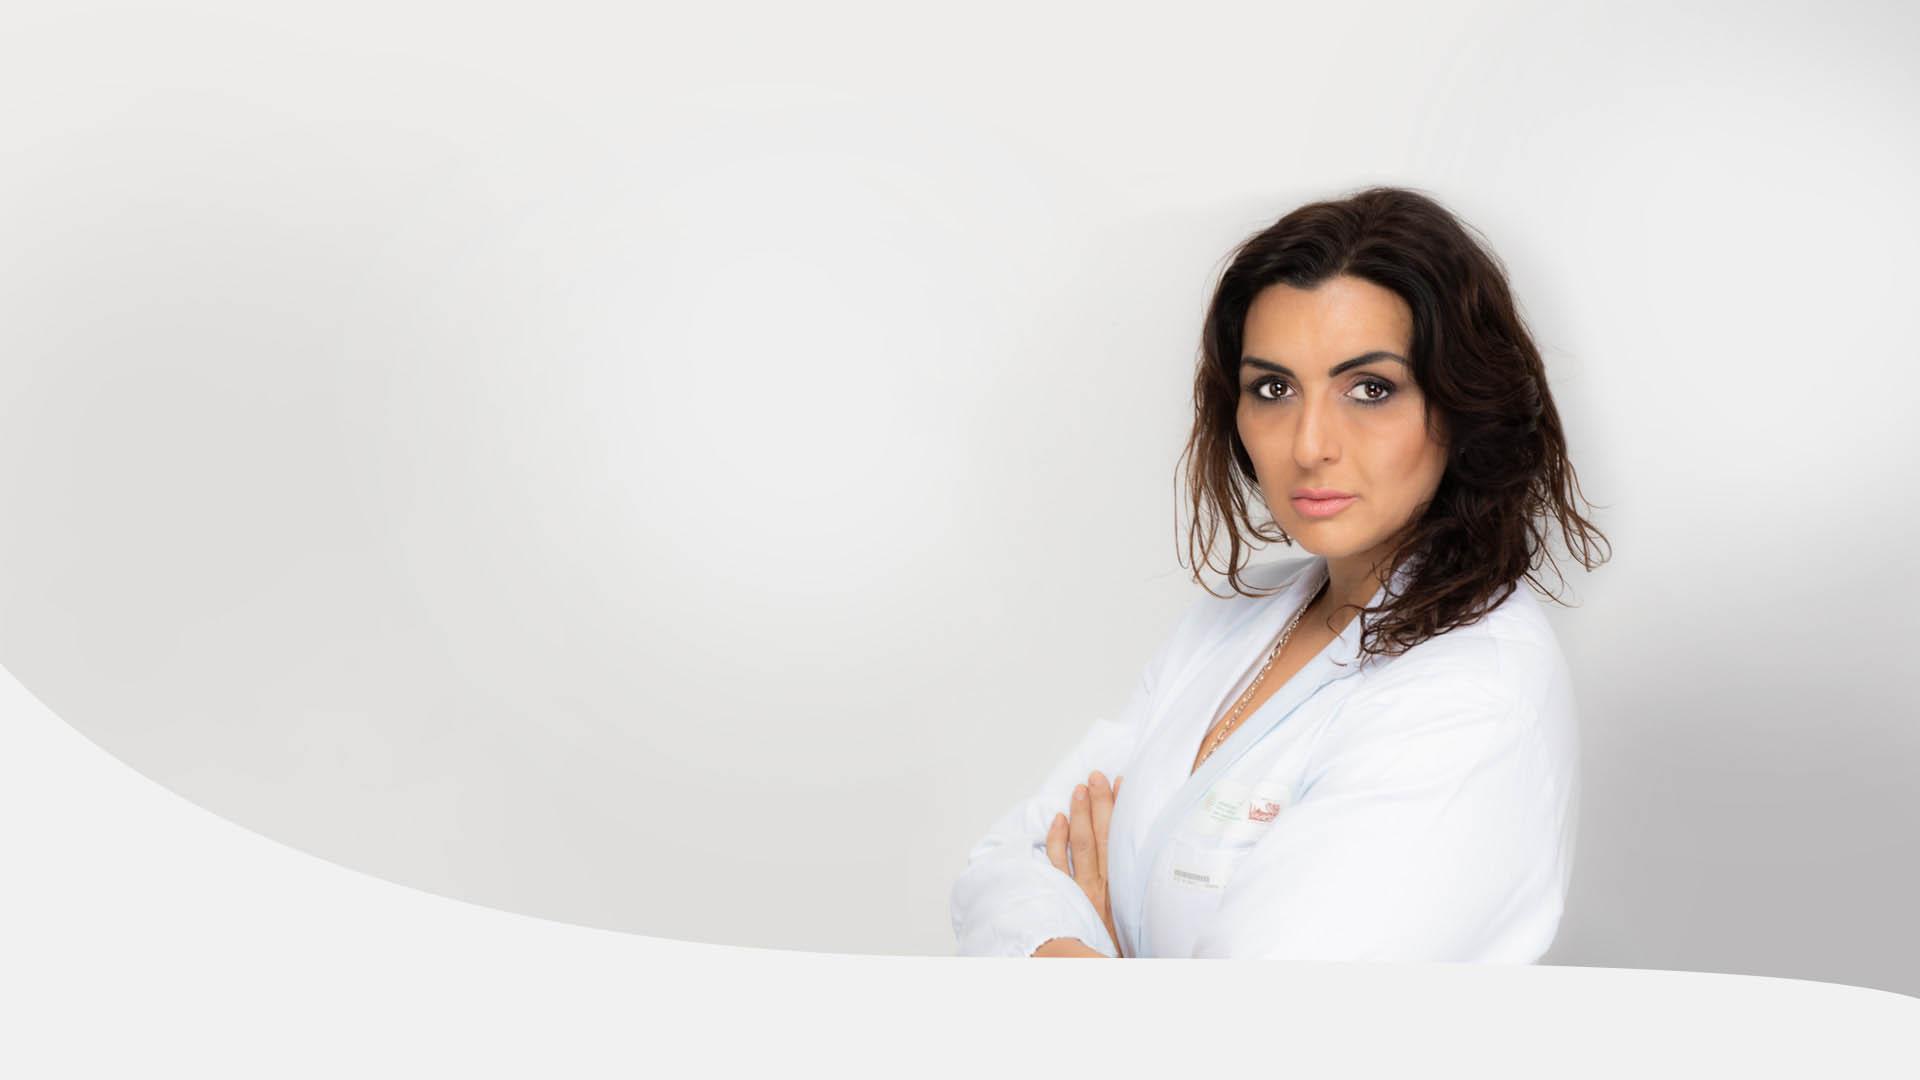 Dott.ssa Francesca Vannini - Sempreinpiedi